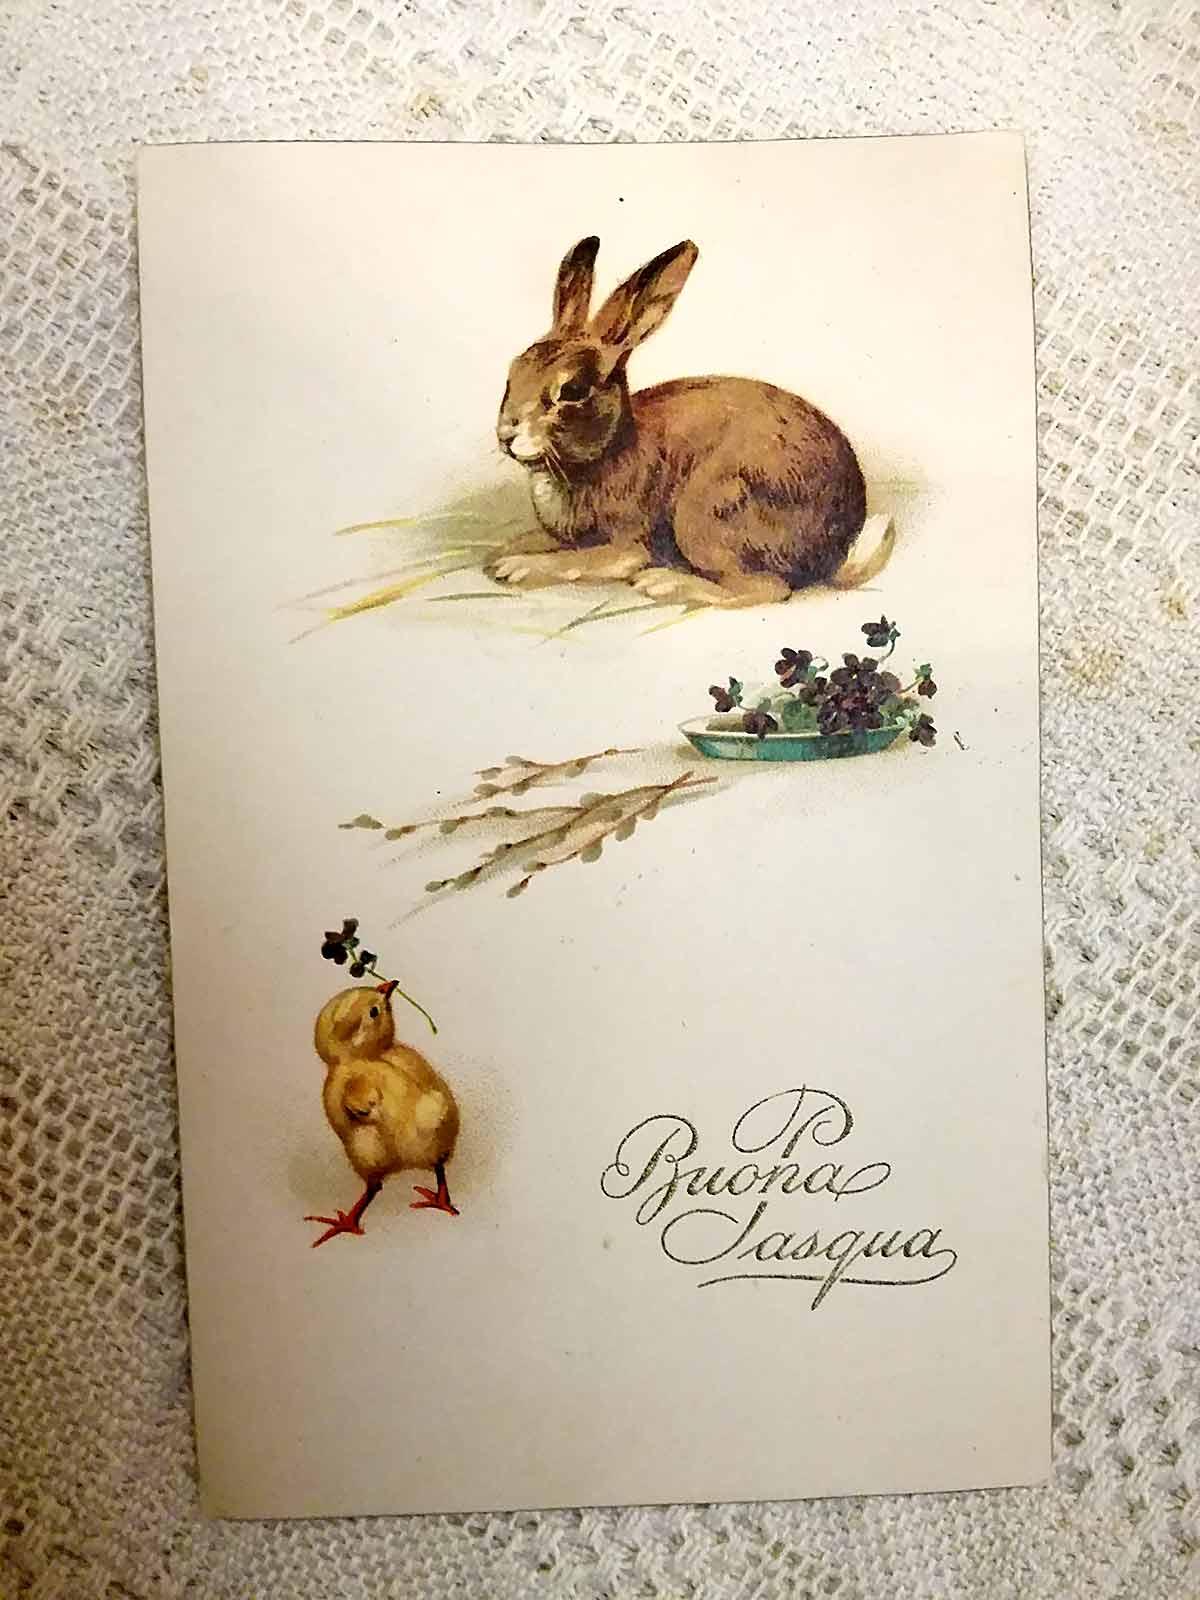 Antique Buona Pasqua postcard